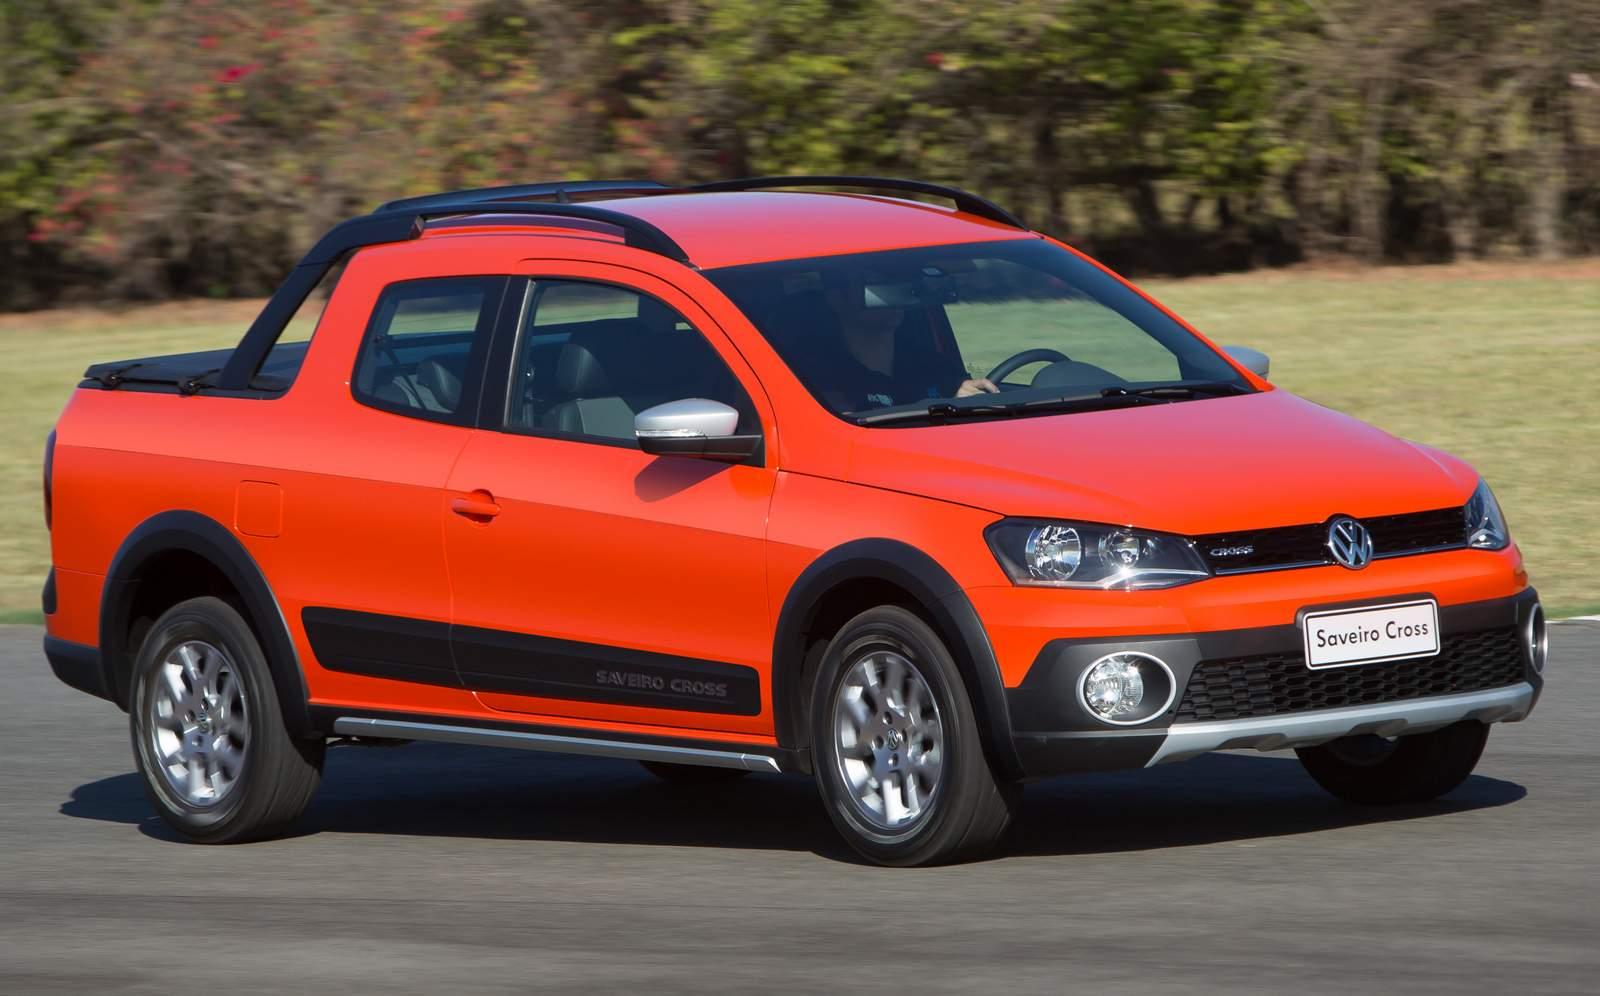 VW Saveiro Cross 2015 - Cabine Dupla